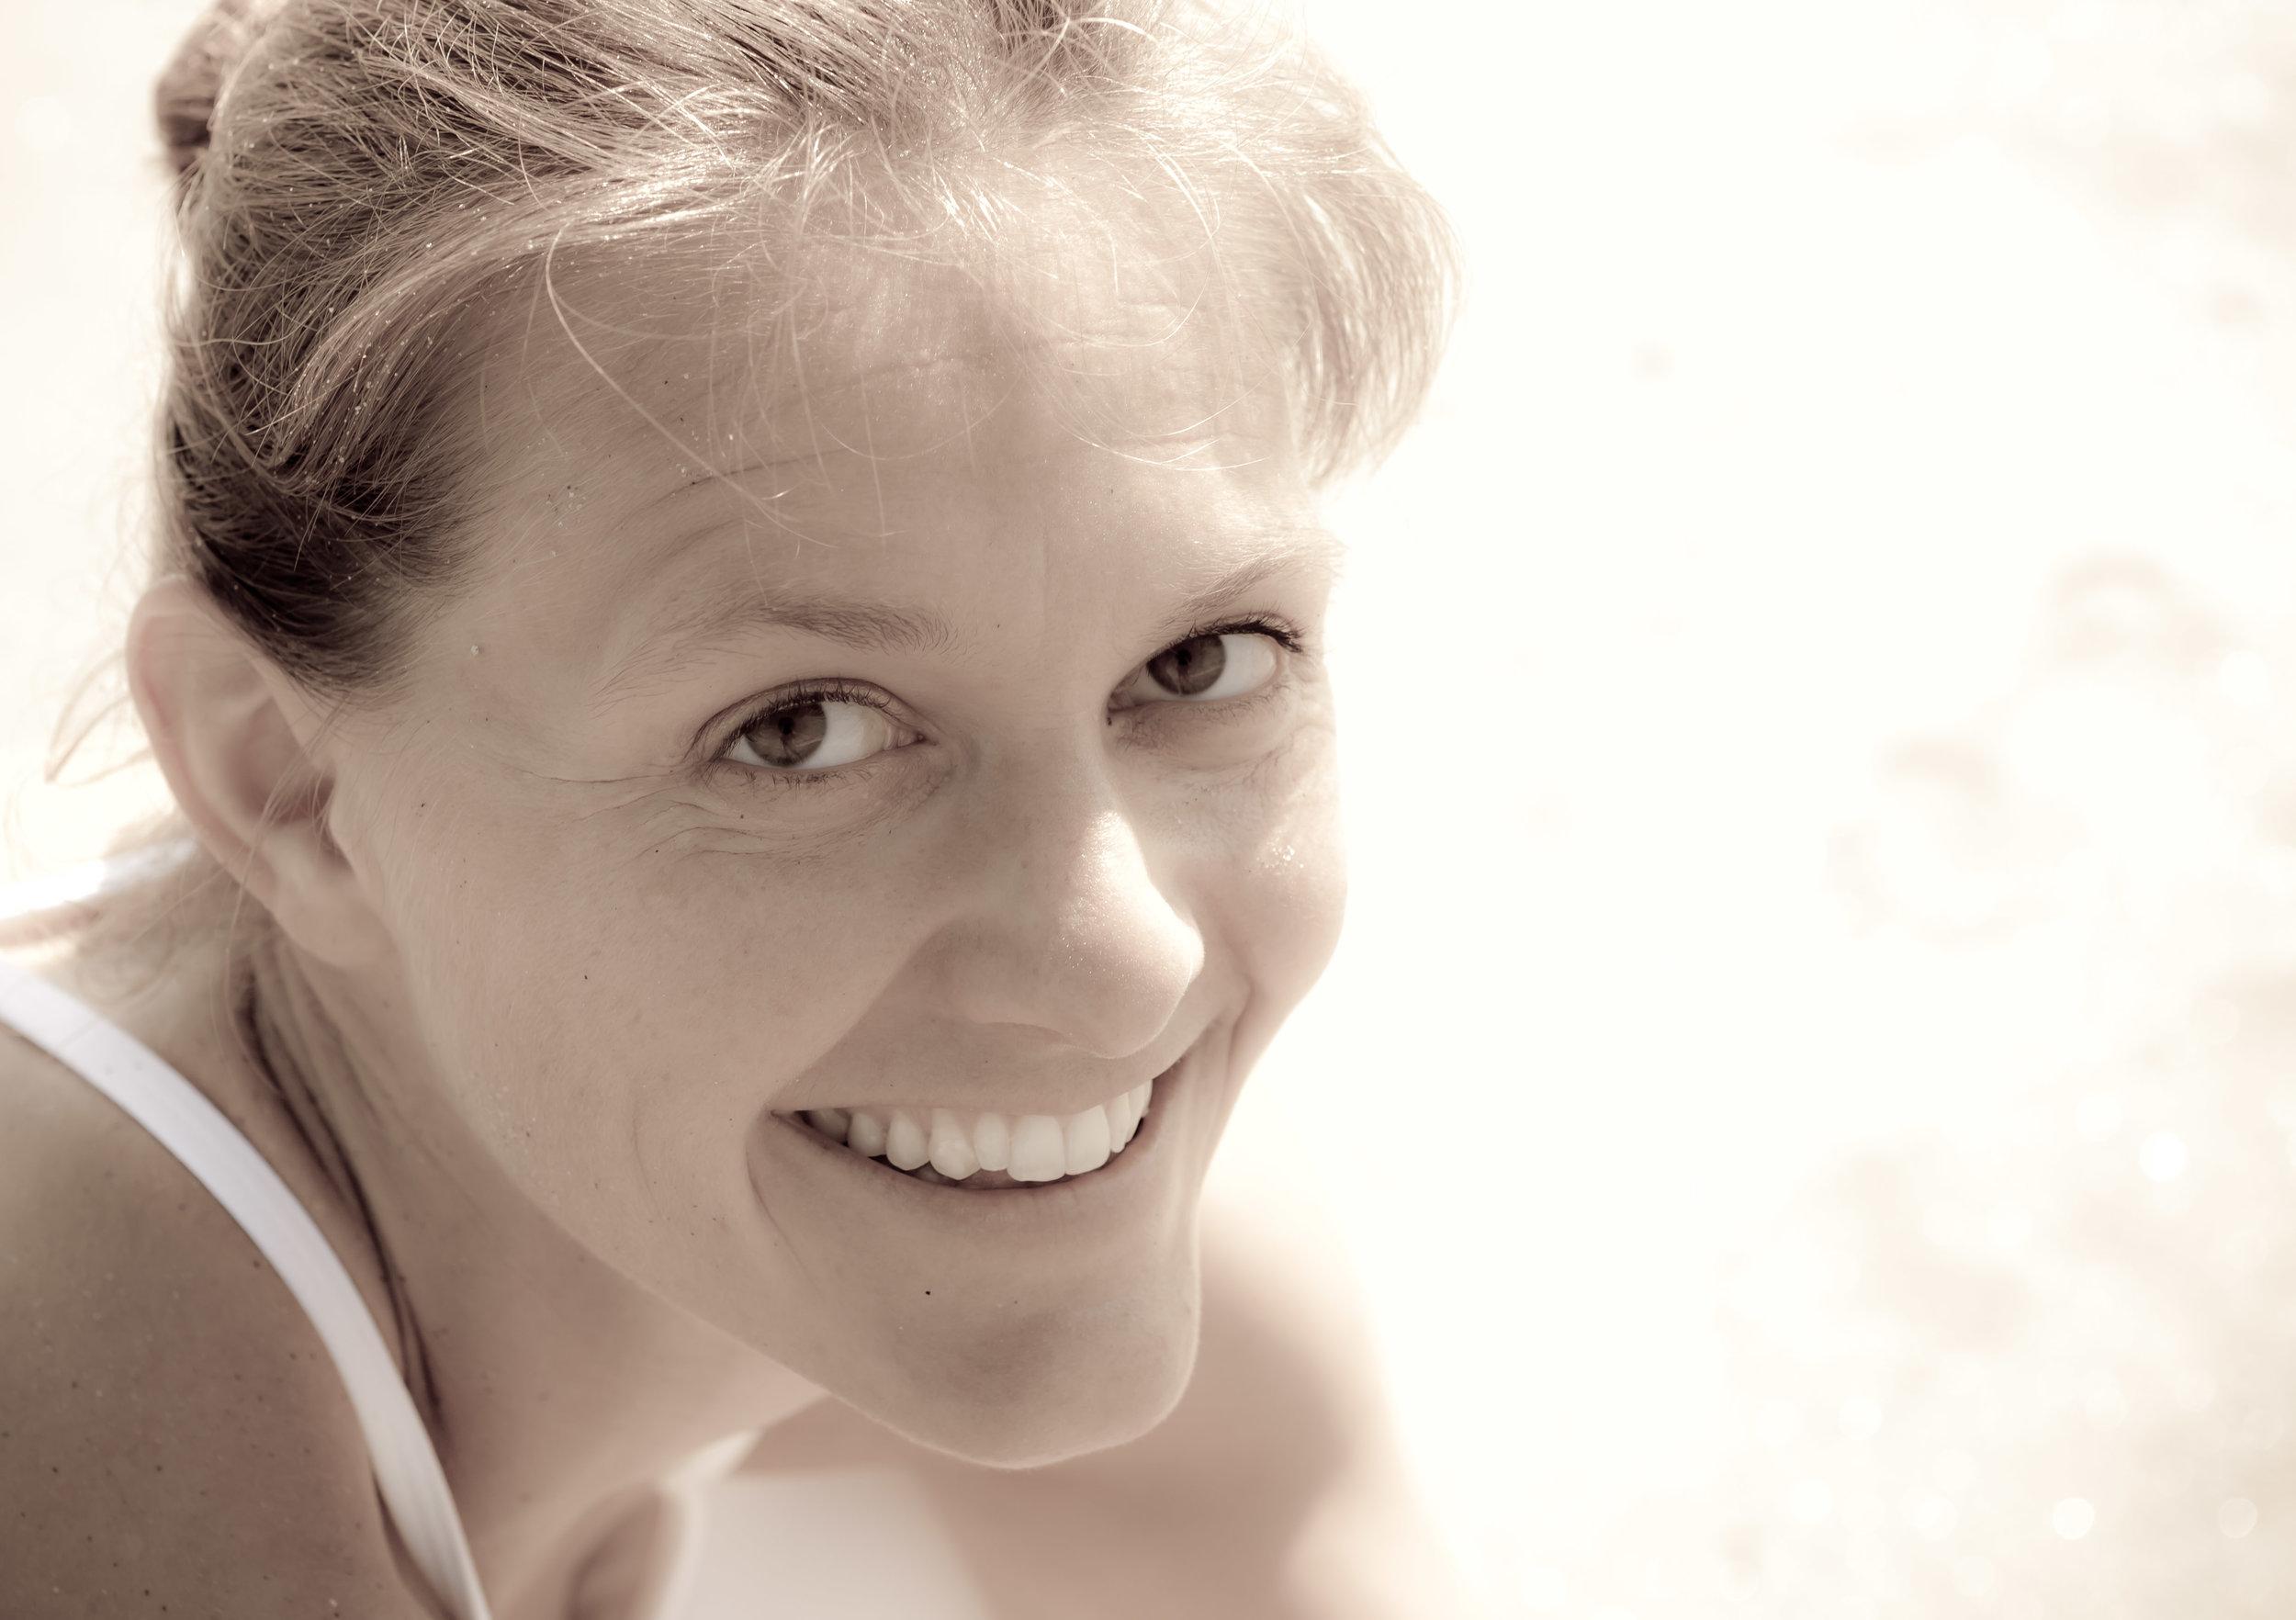 Georgia Reath is a senior yoga teacher and creator of Blue Light Yoga